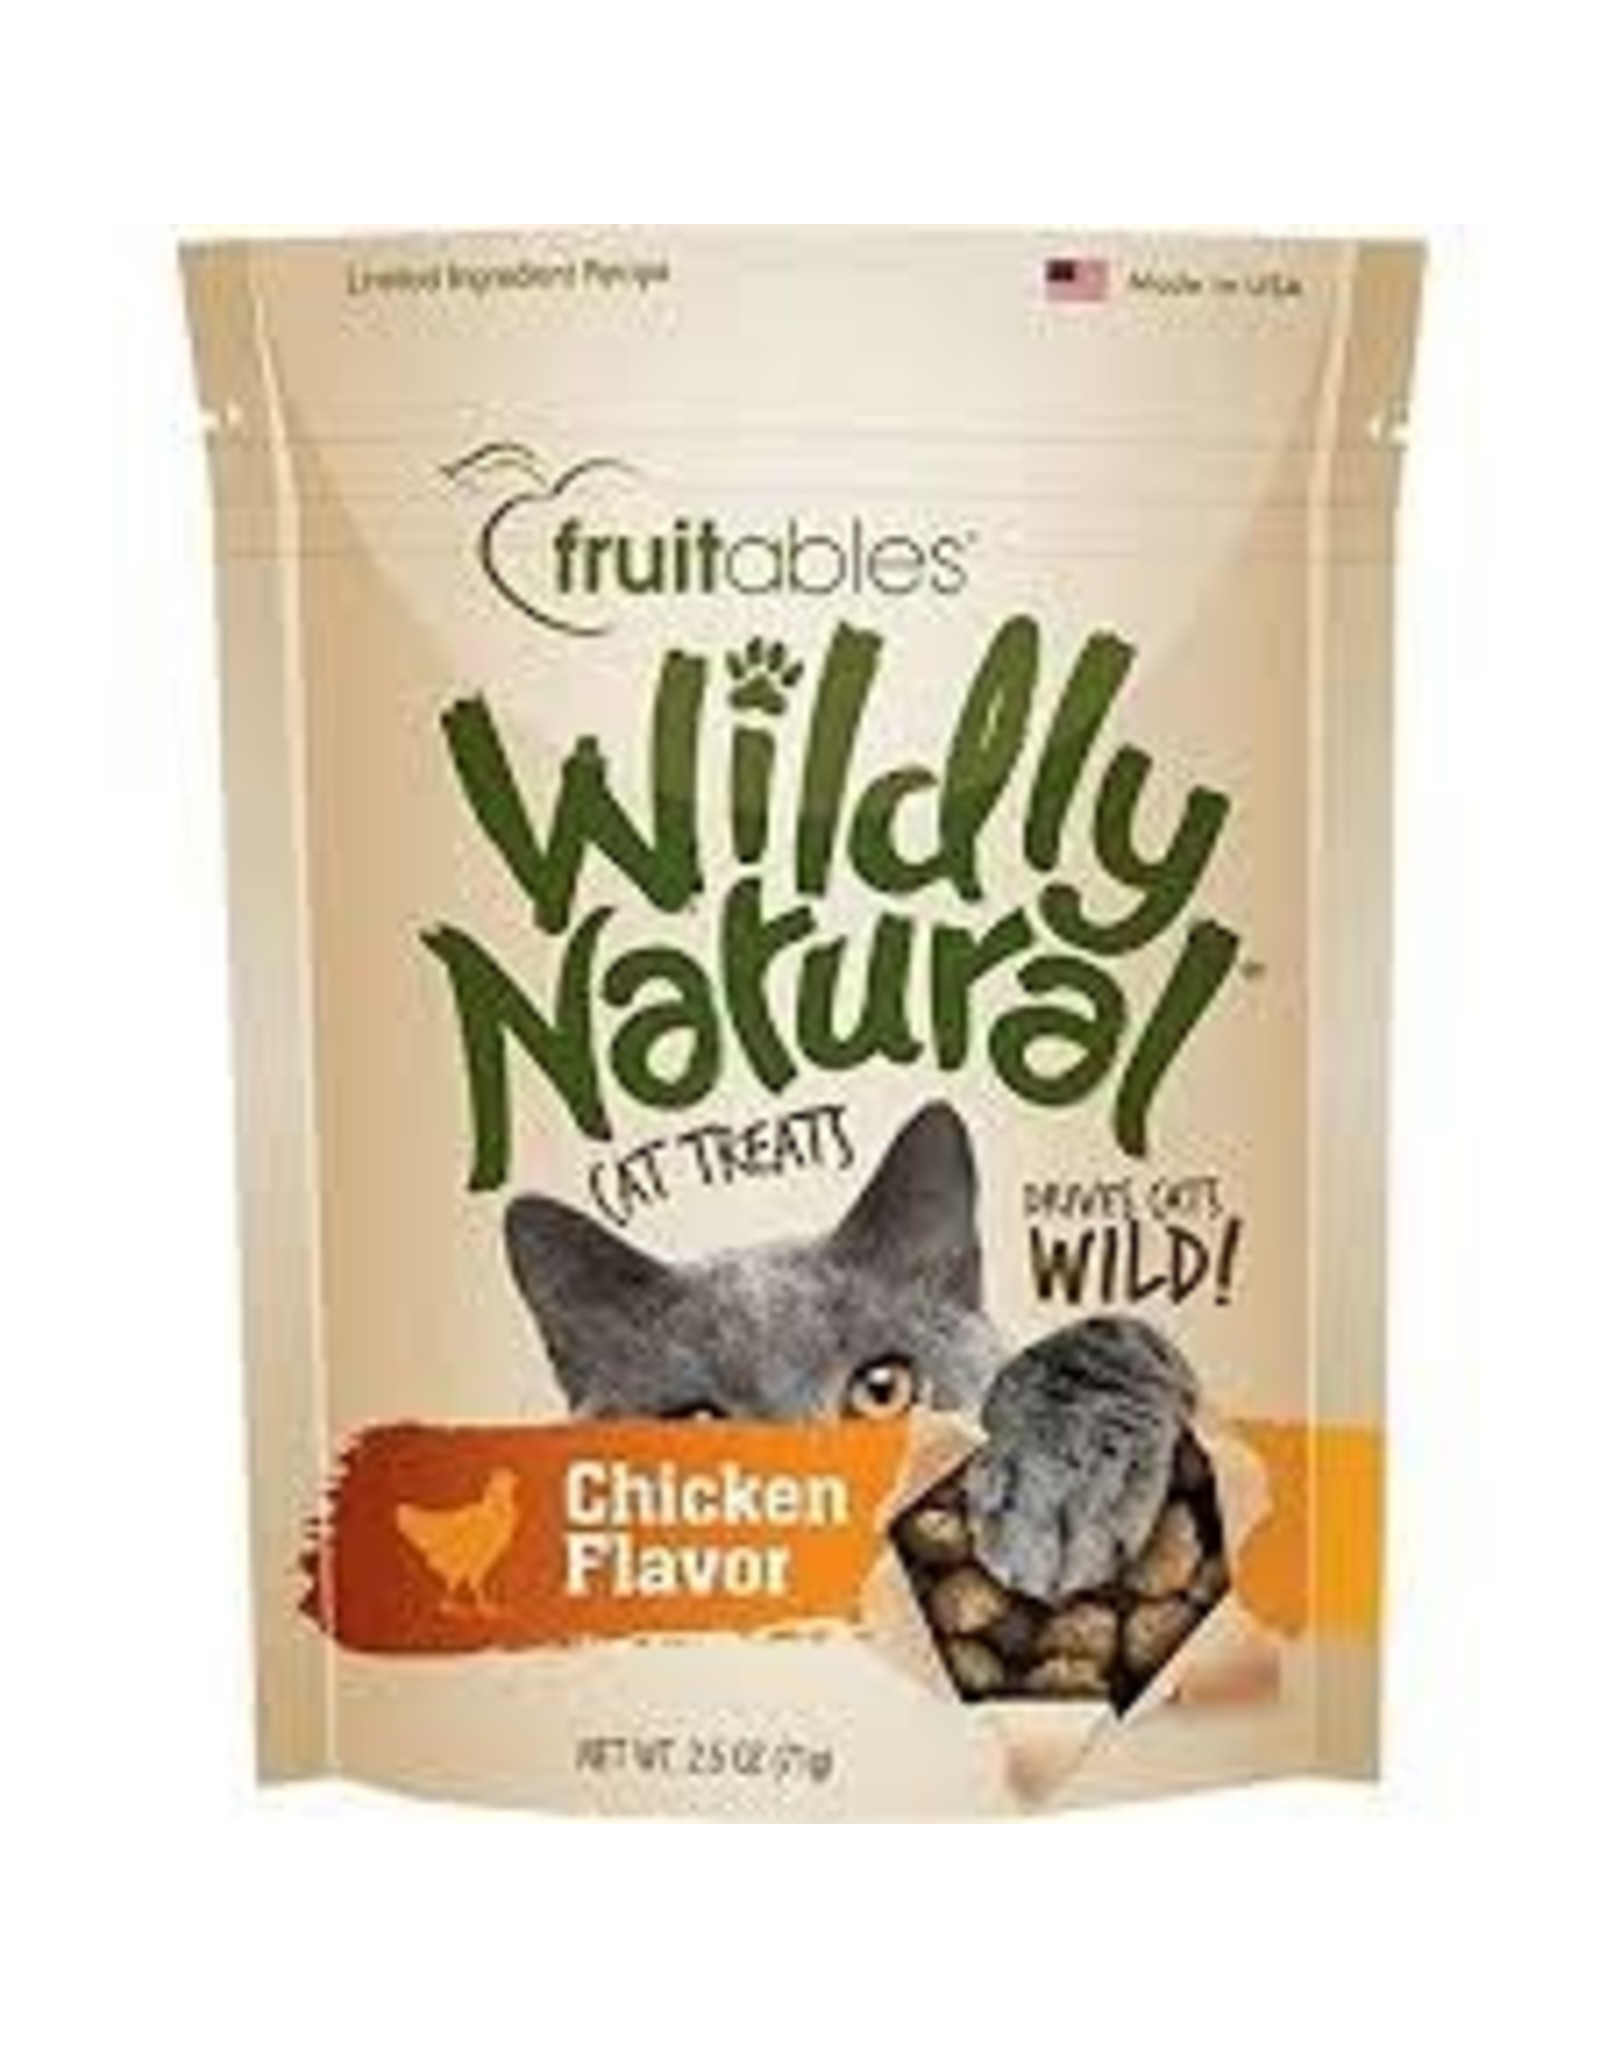 FRUITABLES FRUITABLES WILDLY NATURAL CHICKEN 2.5OZ